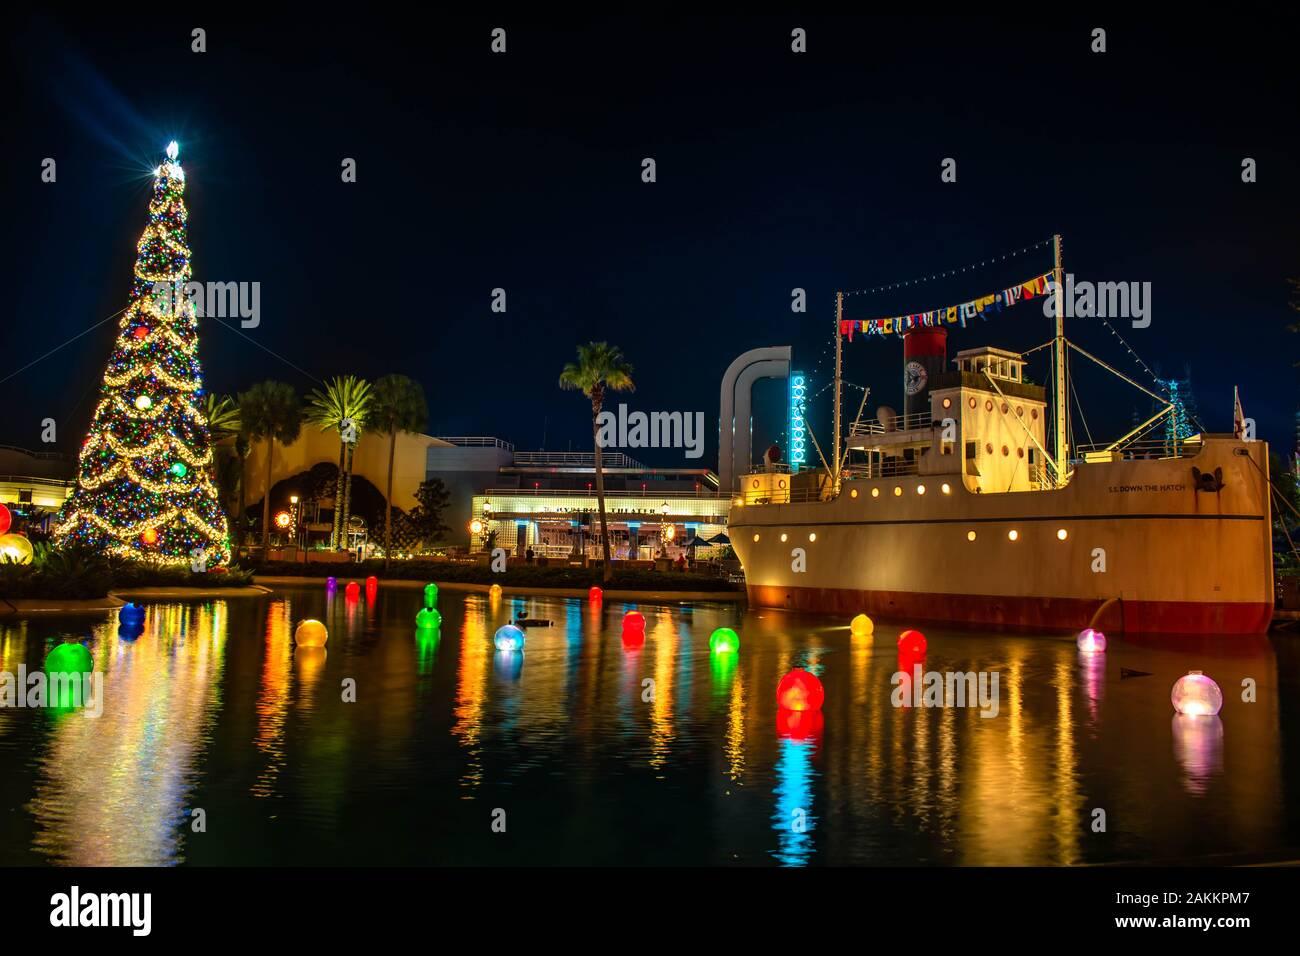 Christmas Balls In Orlando 2020 Orlando, Florida. January 03, 2020, Christmas tree , colorful